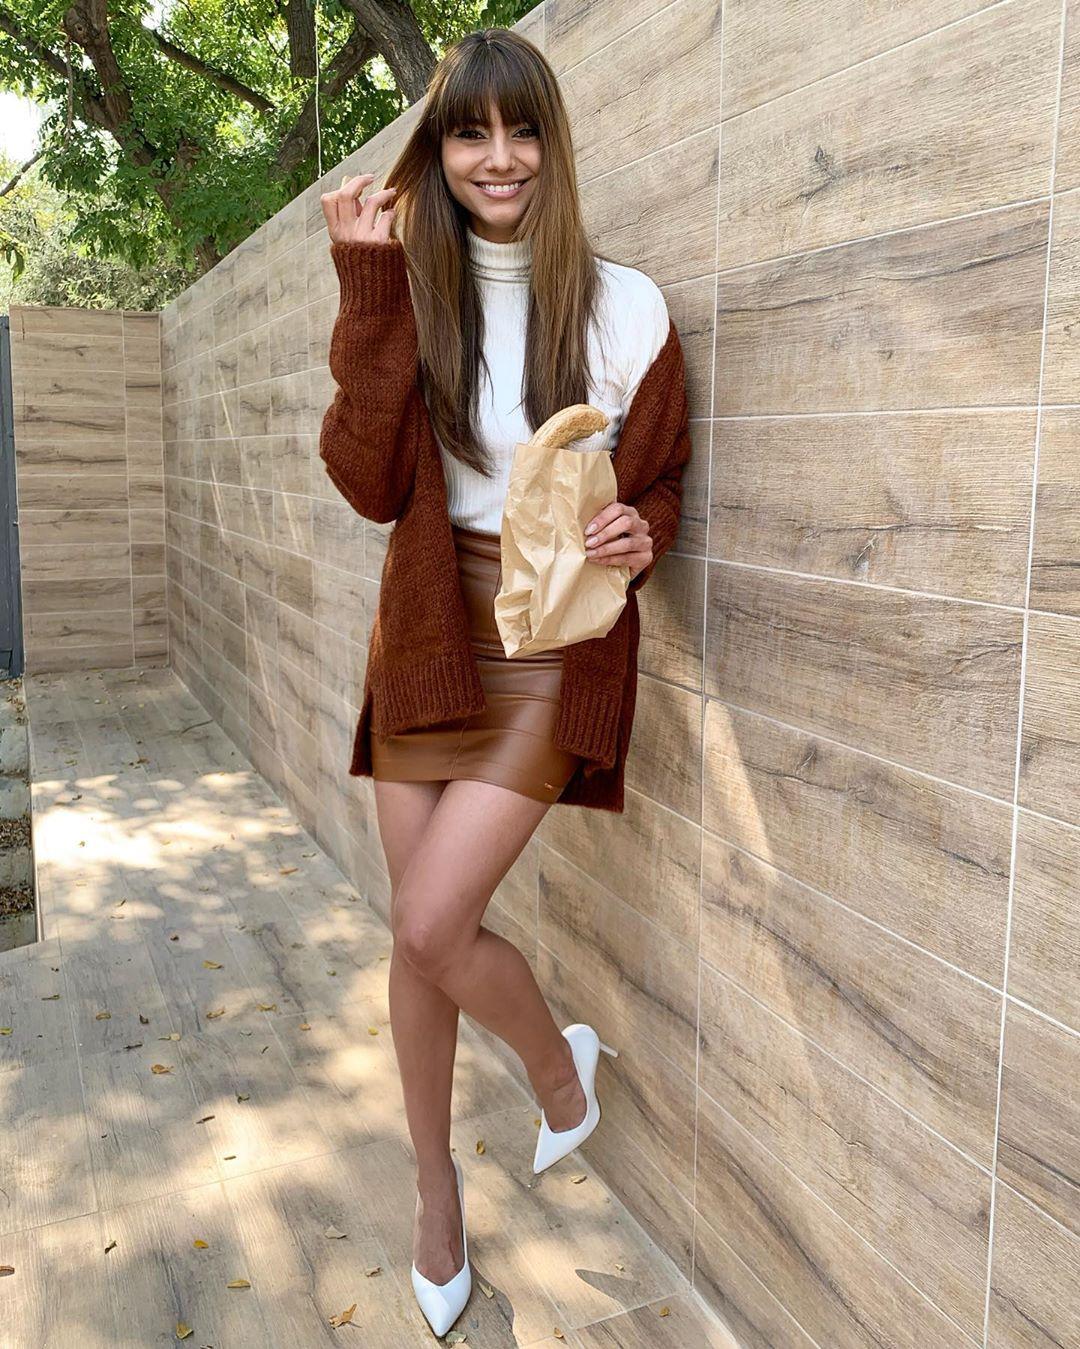 Iliana-Papageorgiou-Wallpapers-Insta-Fit-Bio-5